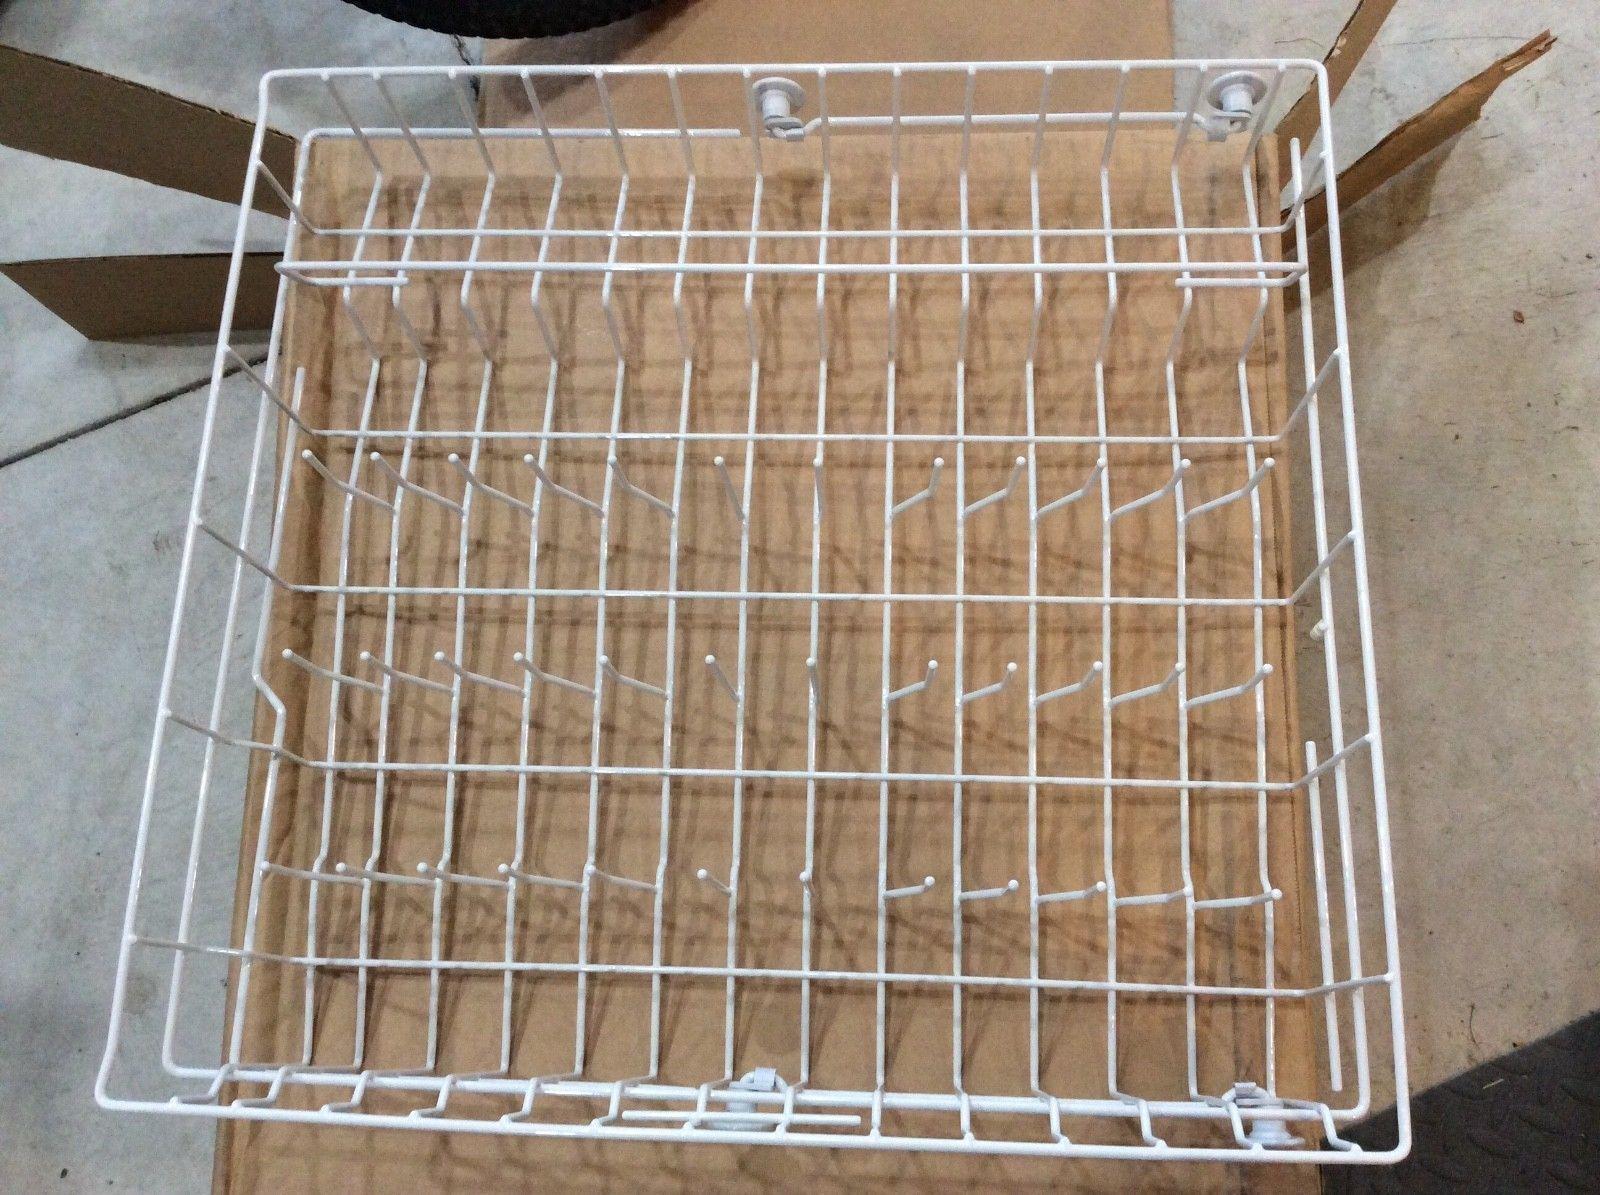 Upper Dishwasher Rack Assembly Part 99001454 New Dishwasher Parts Dishwasher Racks Dishwasher